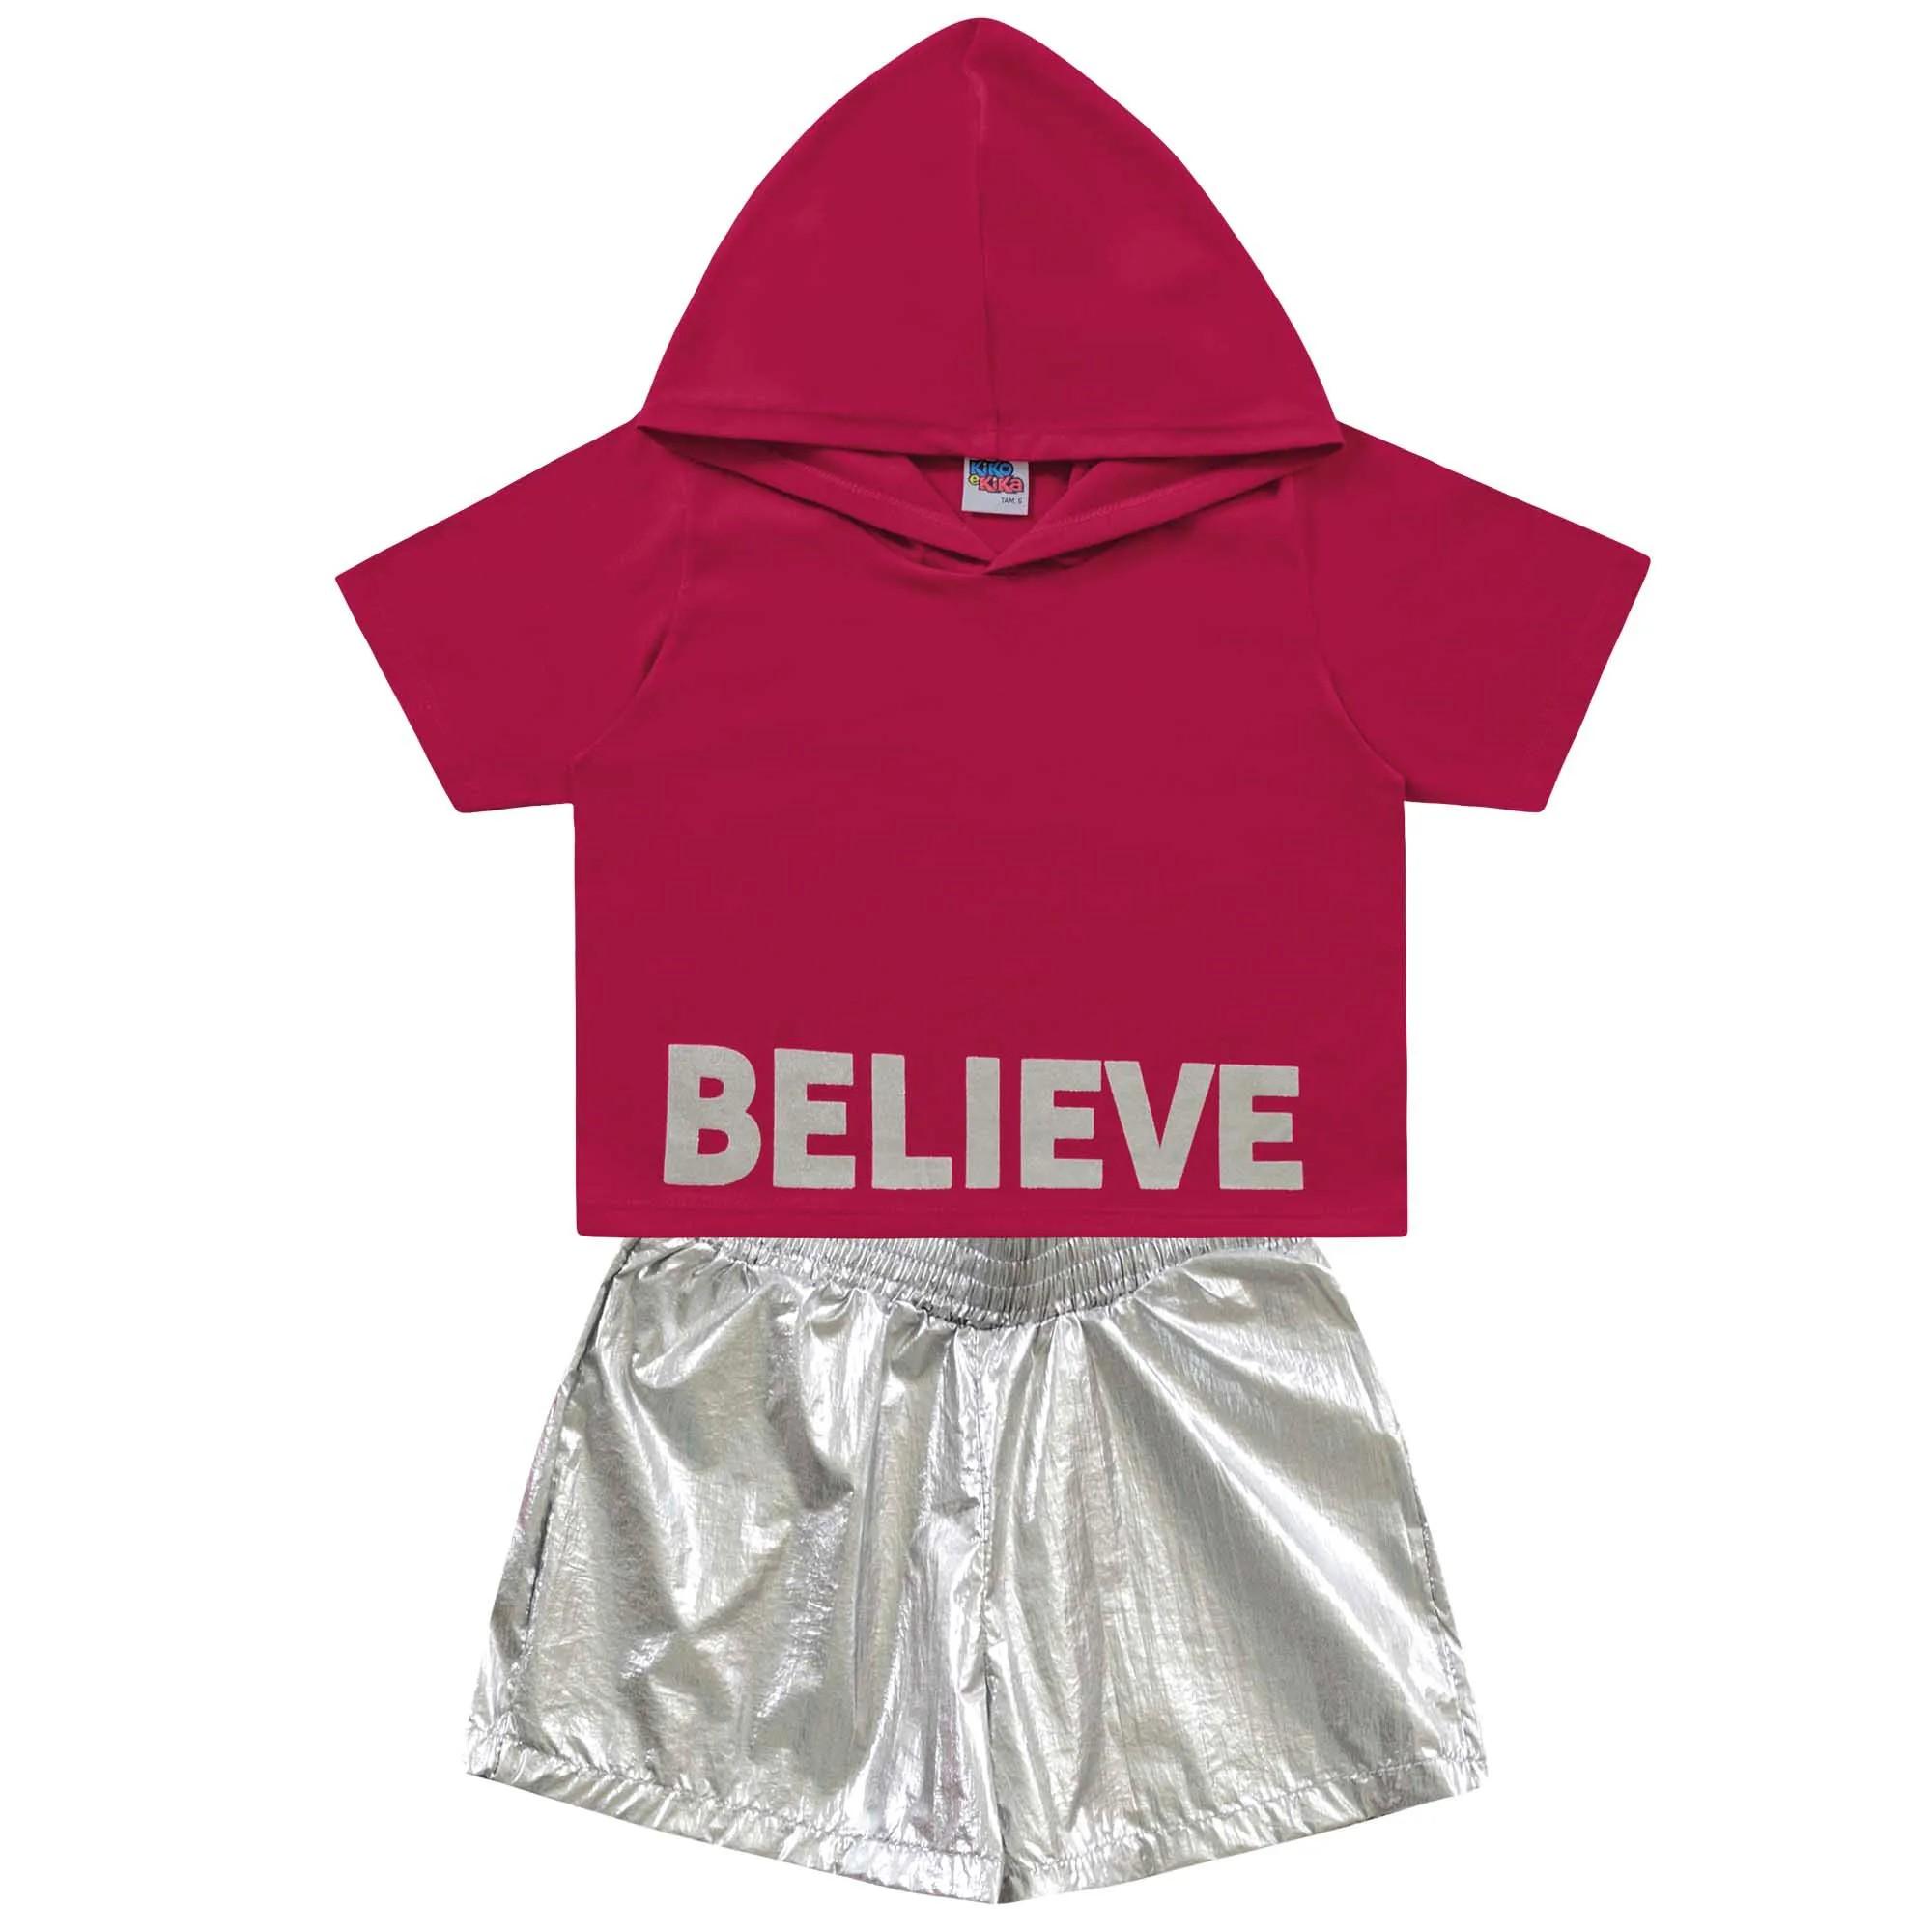 Conjunto Verão Kiko e Kika Cropped e Shorts Believe - 4 ao 10